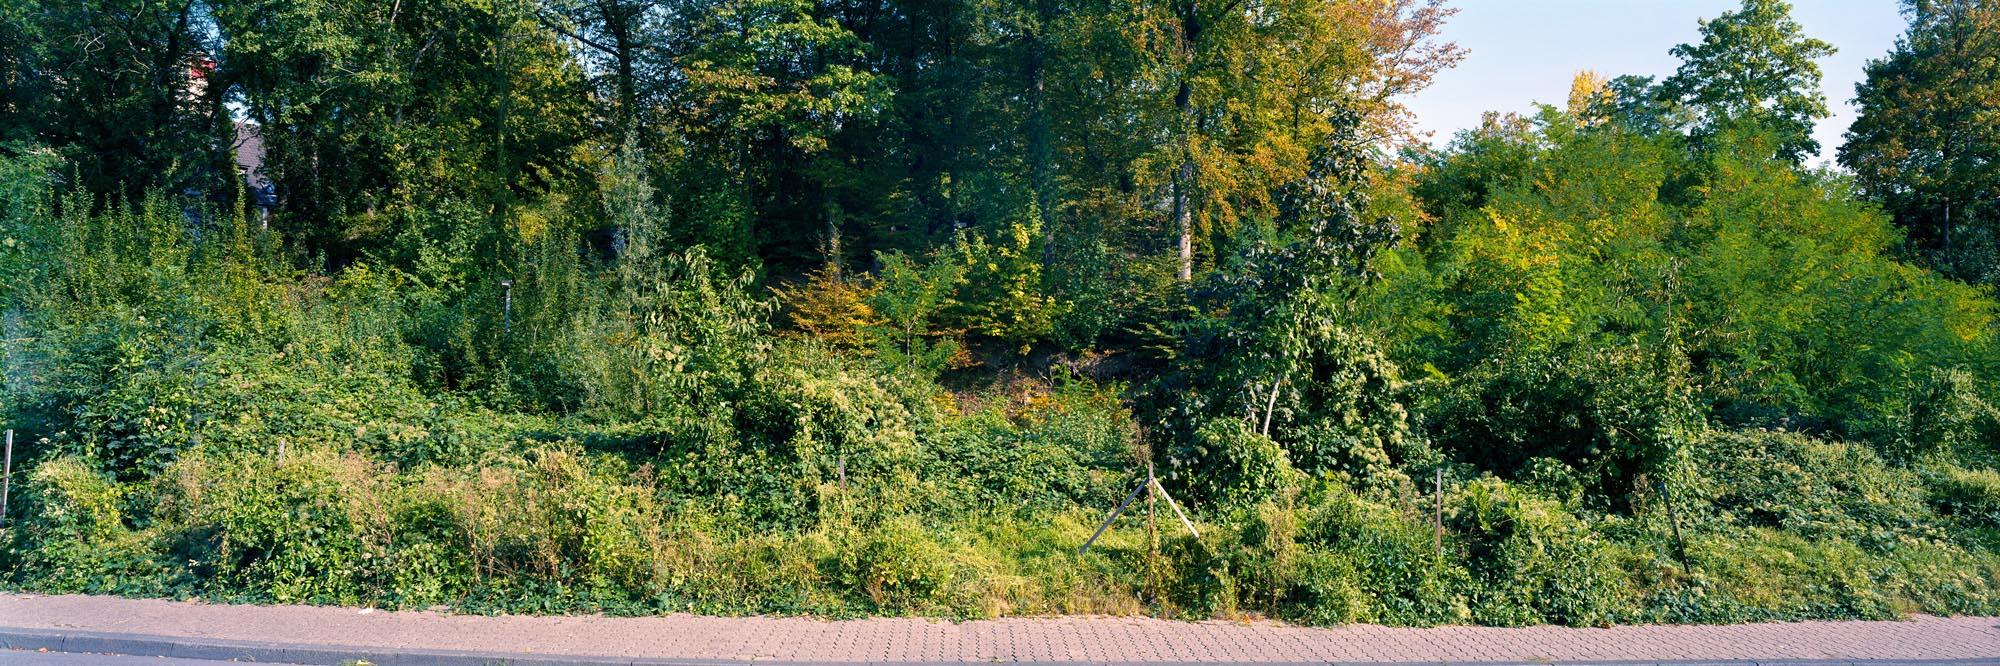 Wald in GL